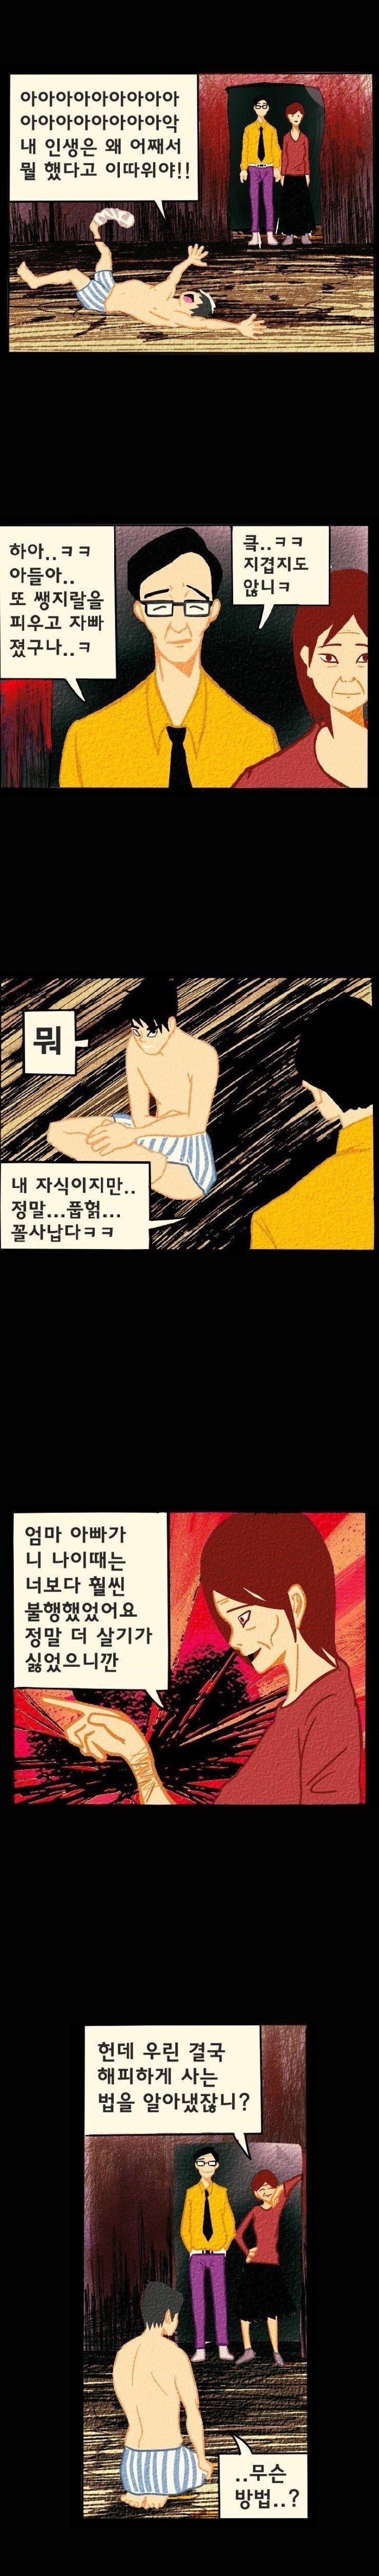 1.jpg 탄생비화를 알게되는.manhwa